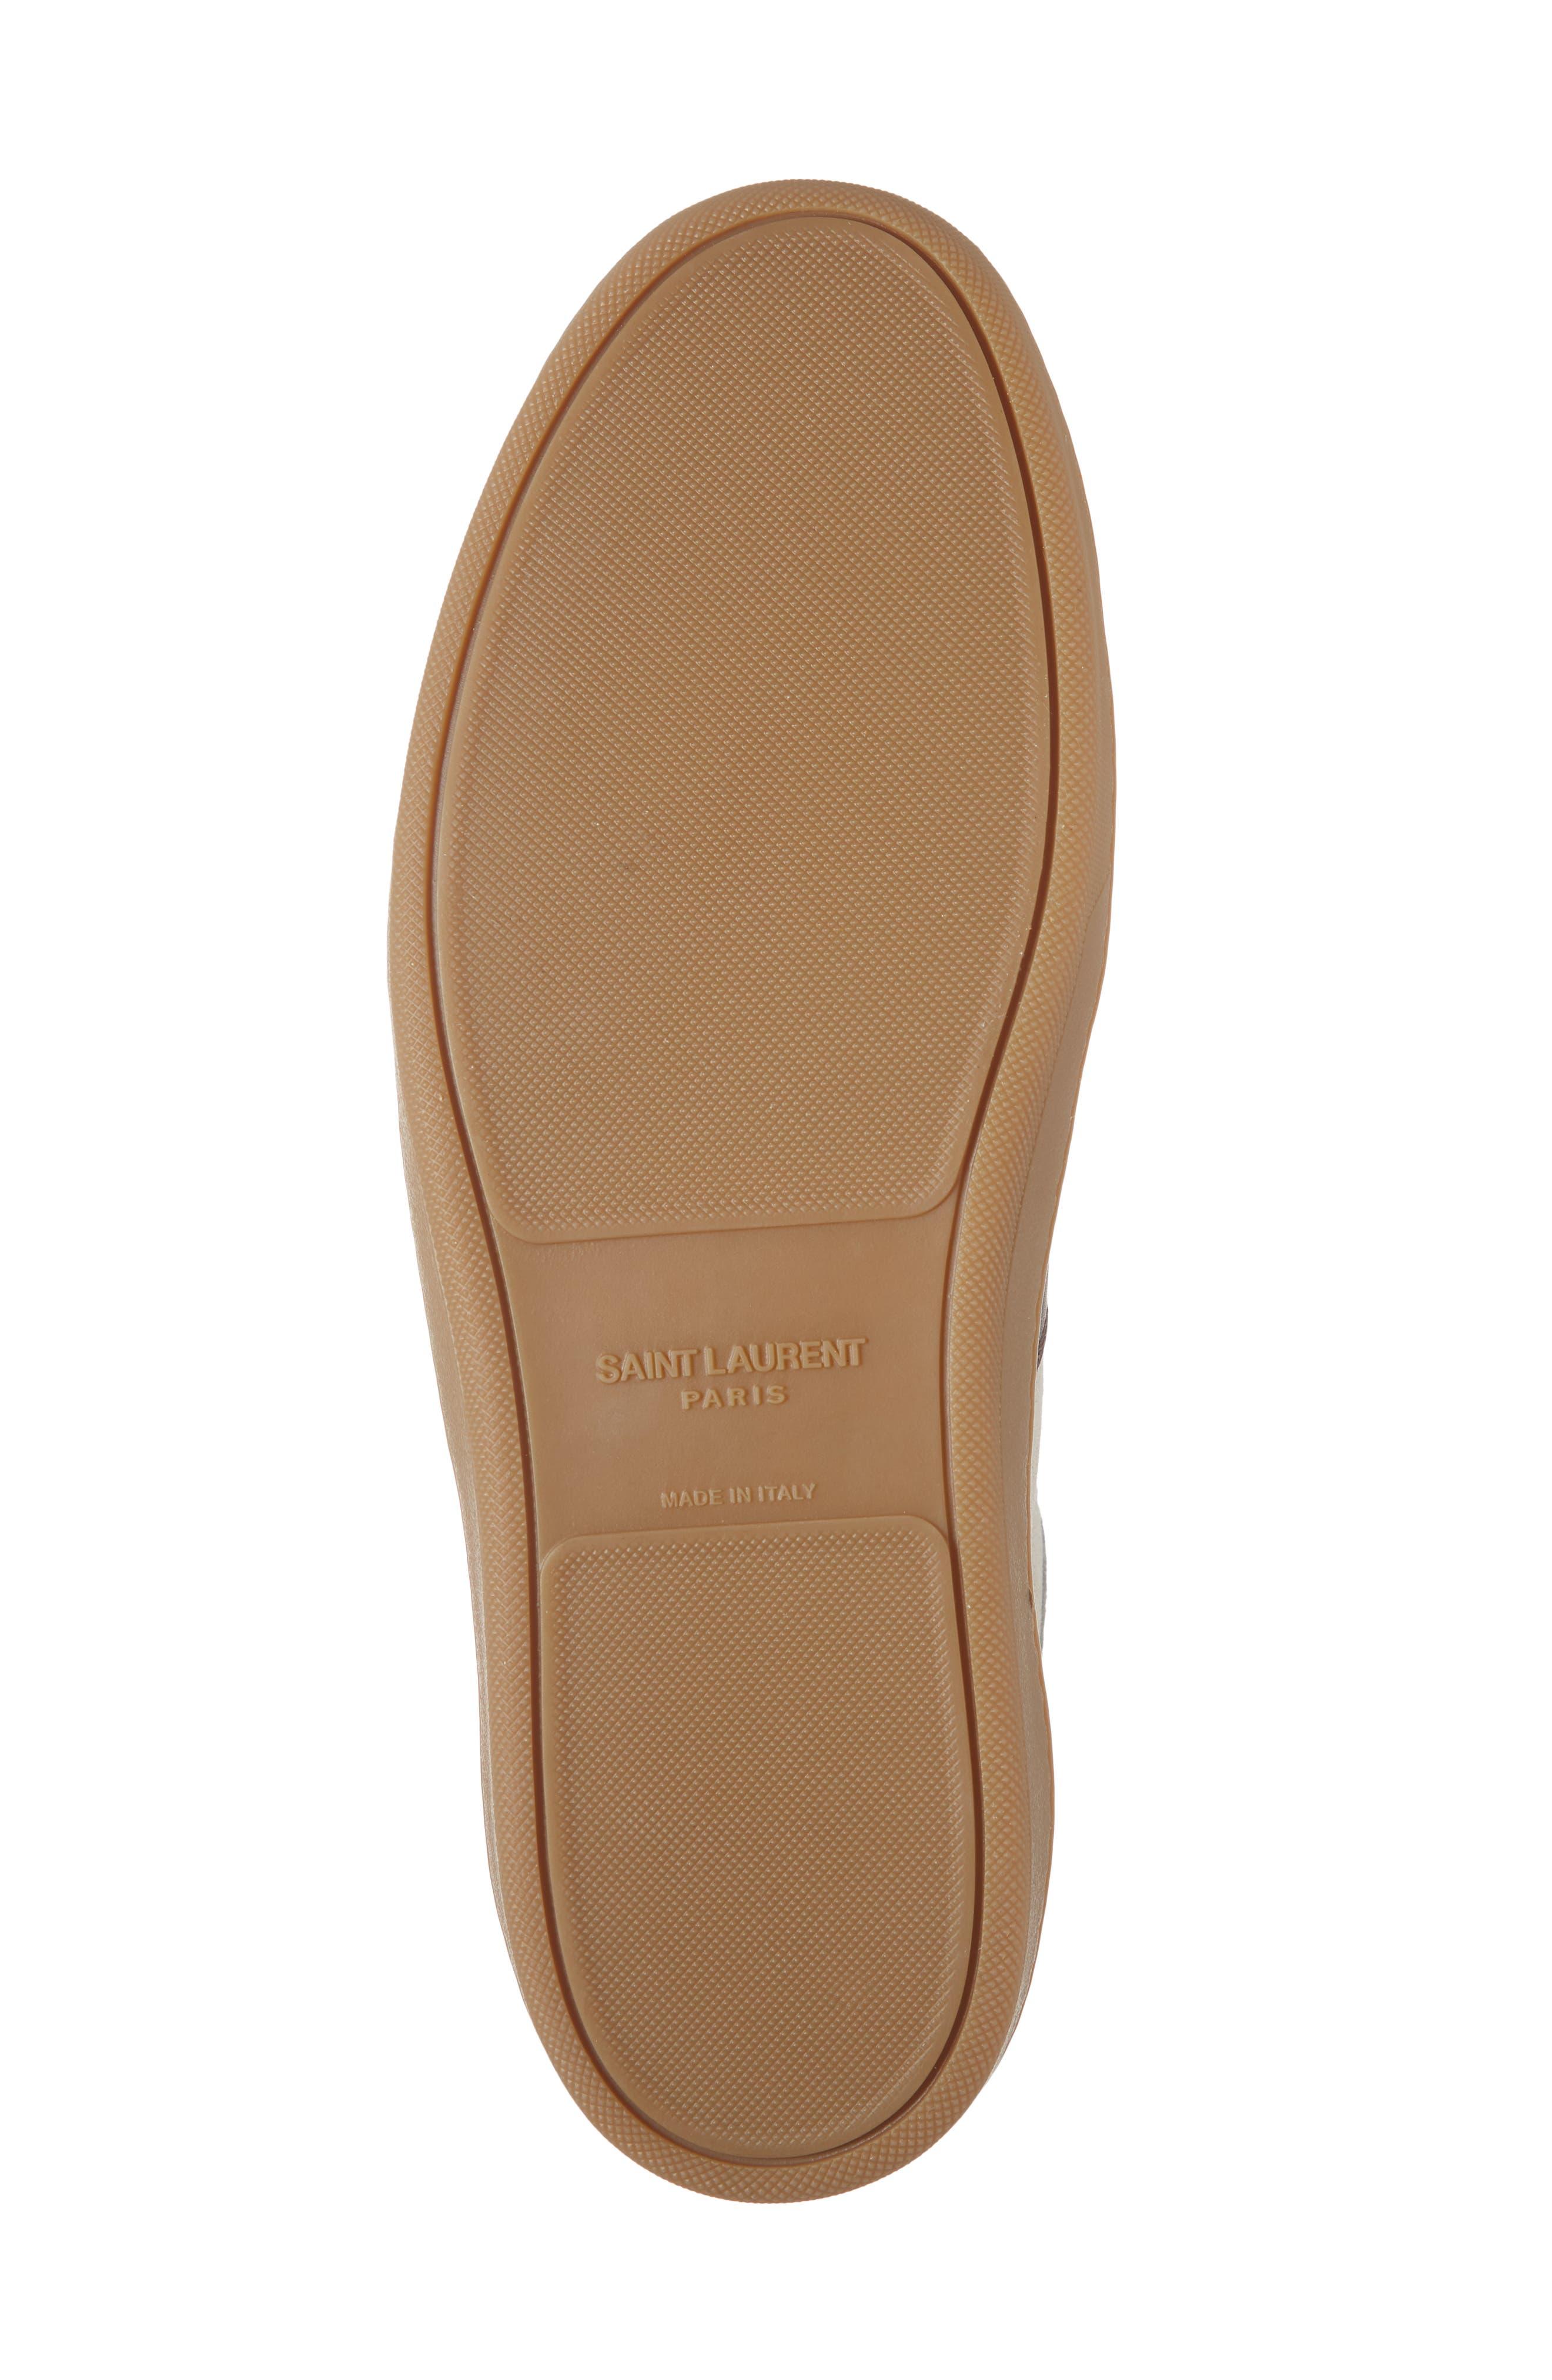 SL/10H Signature Court Classic High-Top Sneaker,                             Alternate thumbnail 3, color,                             Milk/ Barolo